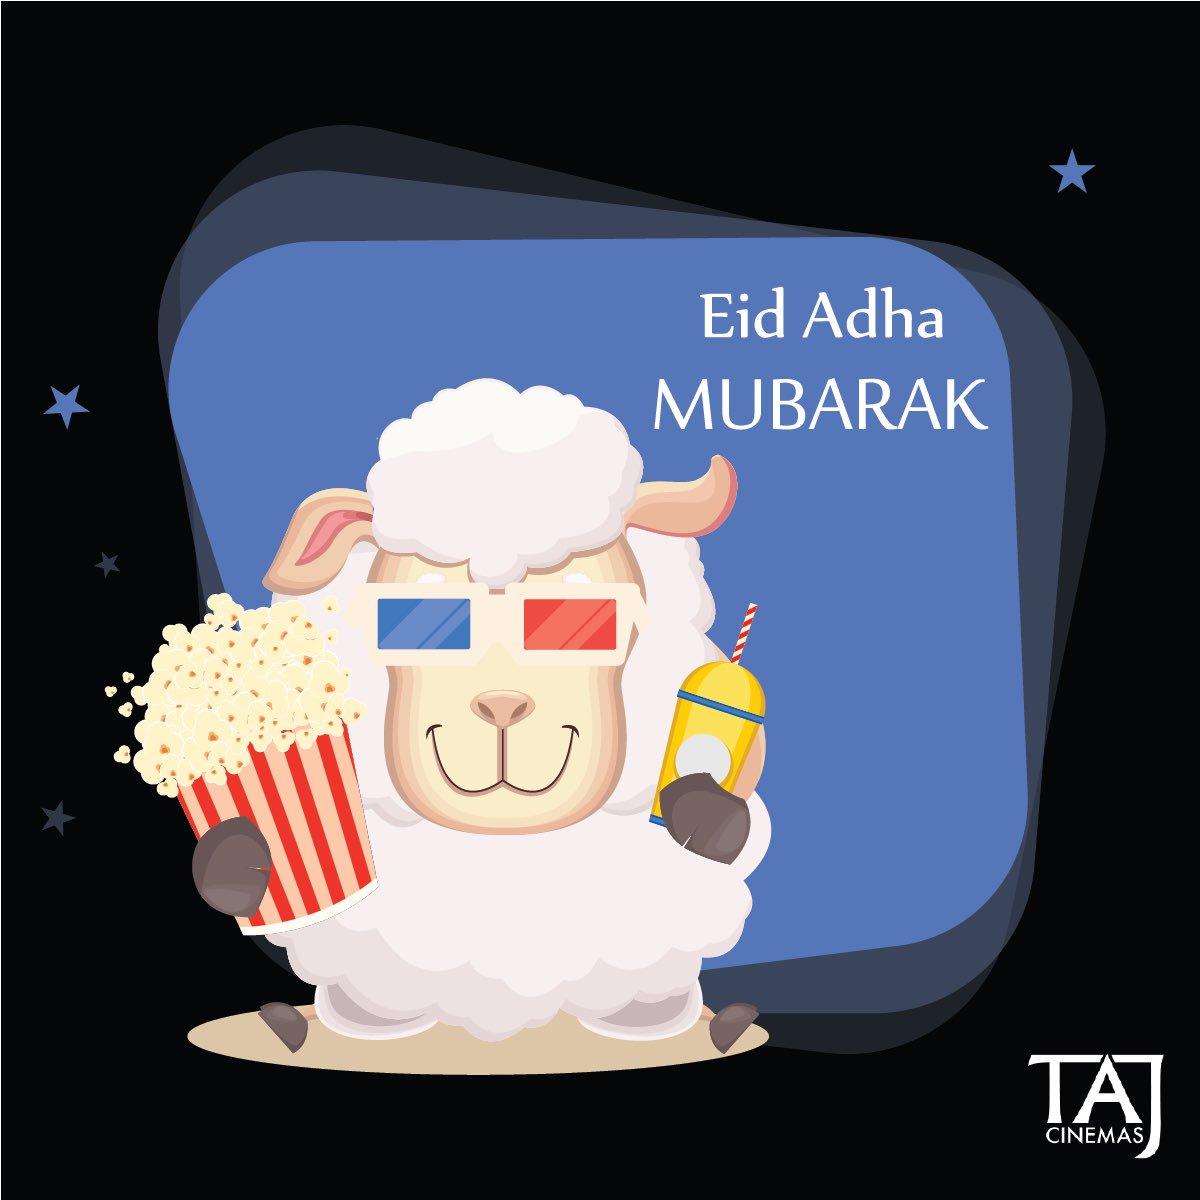 Eid Adha Mubarak to everyone. #TAJCinemas #Movies #EidAlAdha #Jo #Amman https://t.co/j9Klc1OVyt